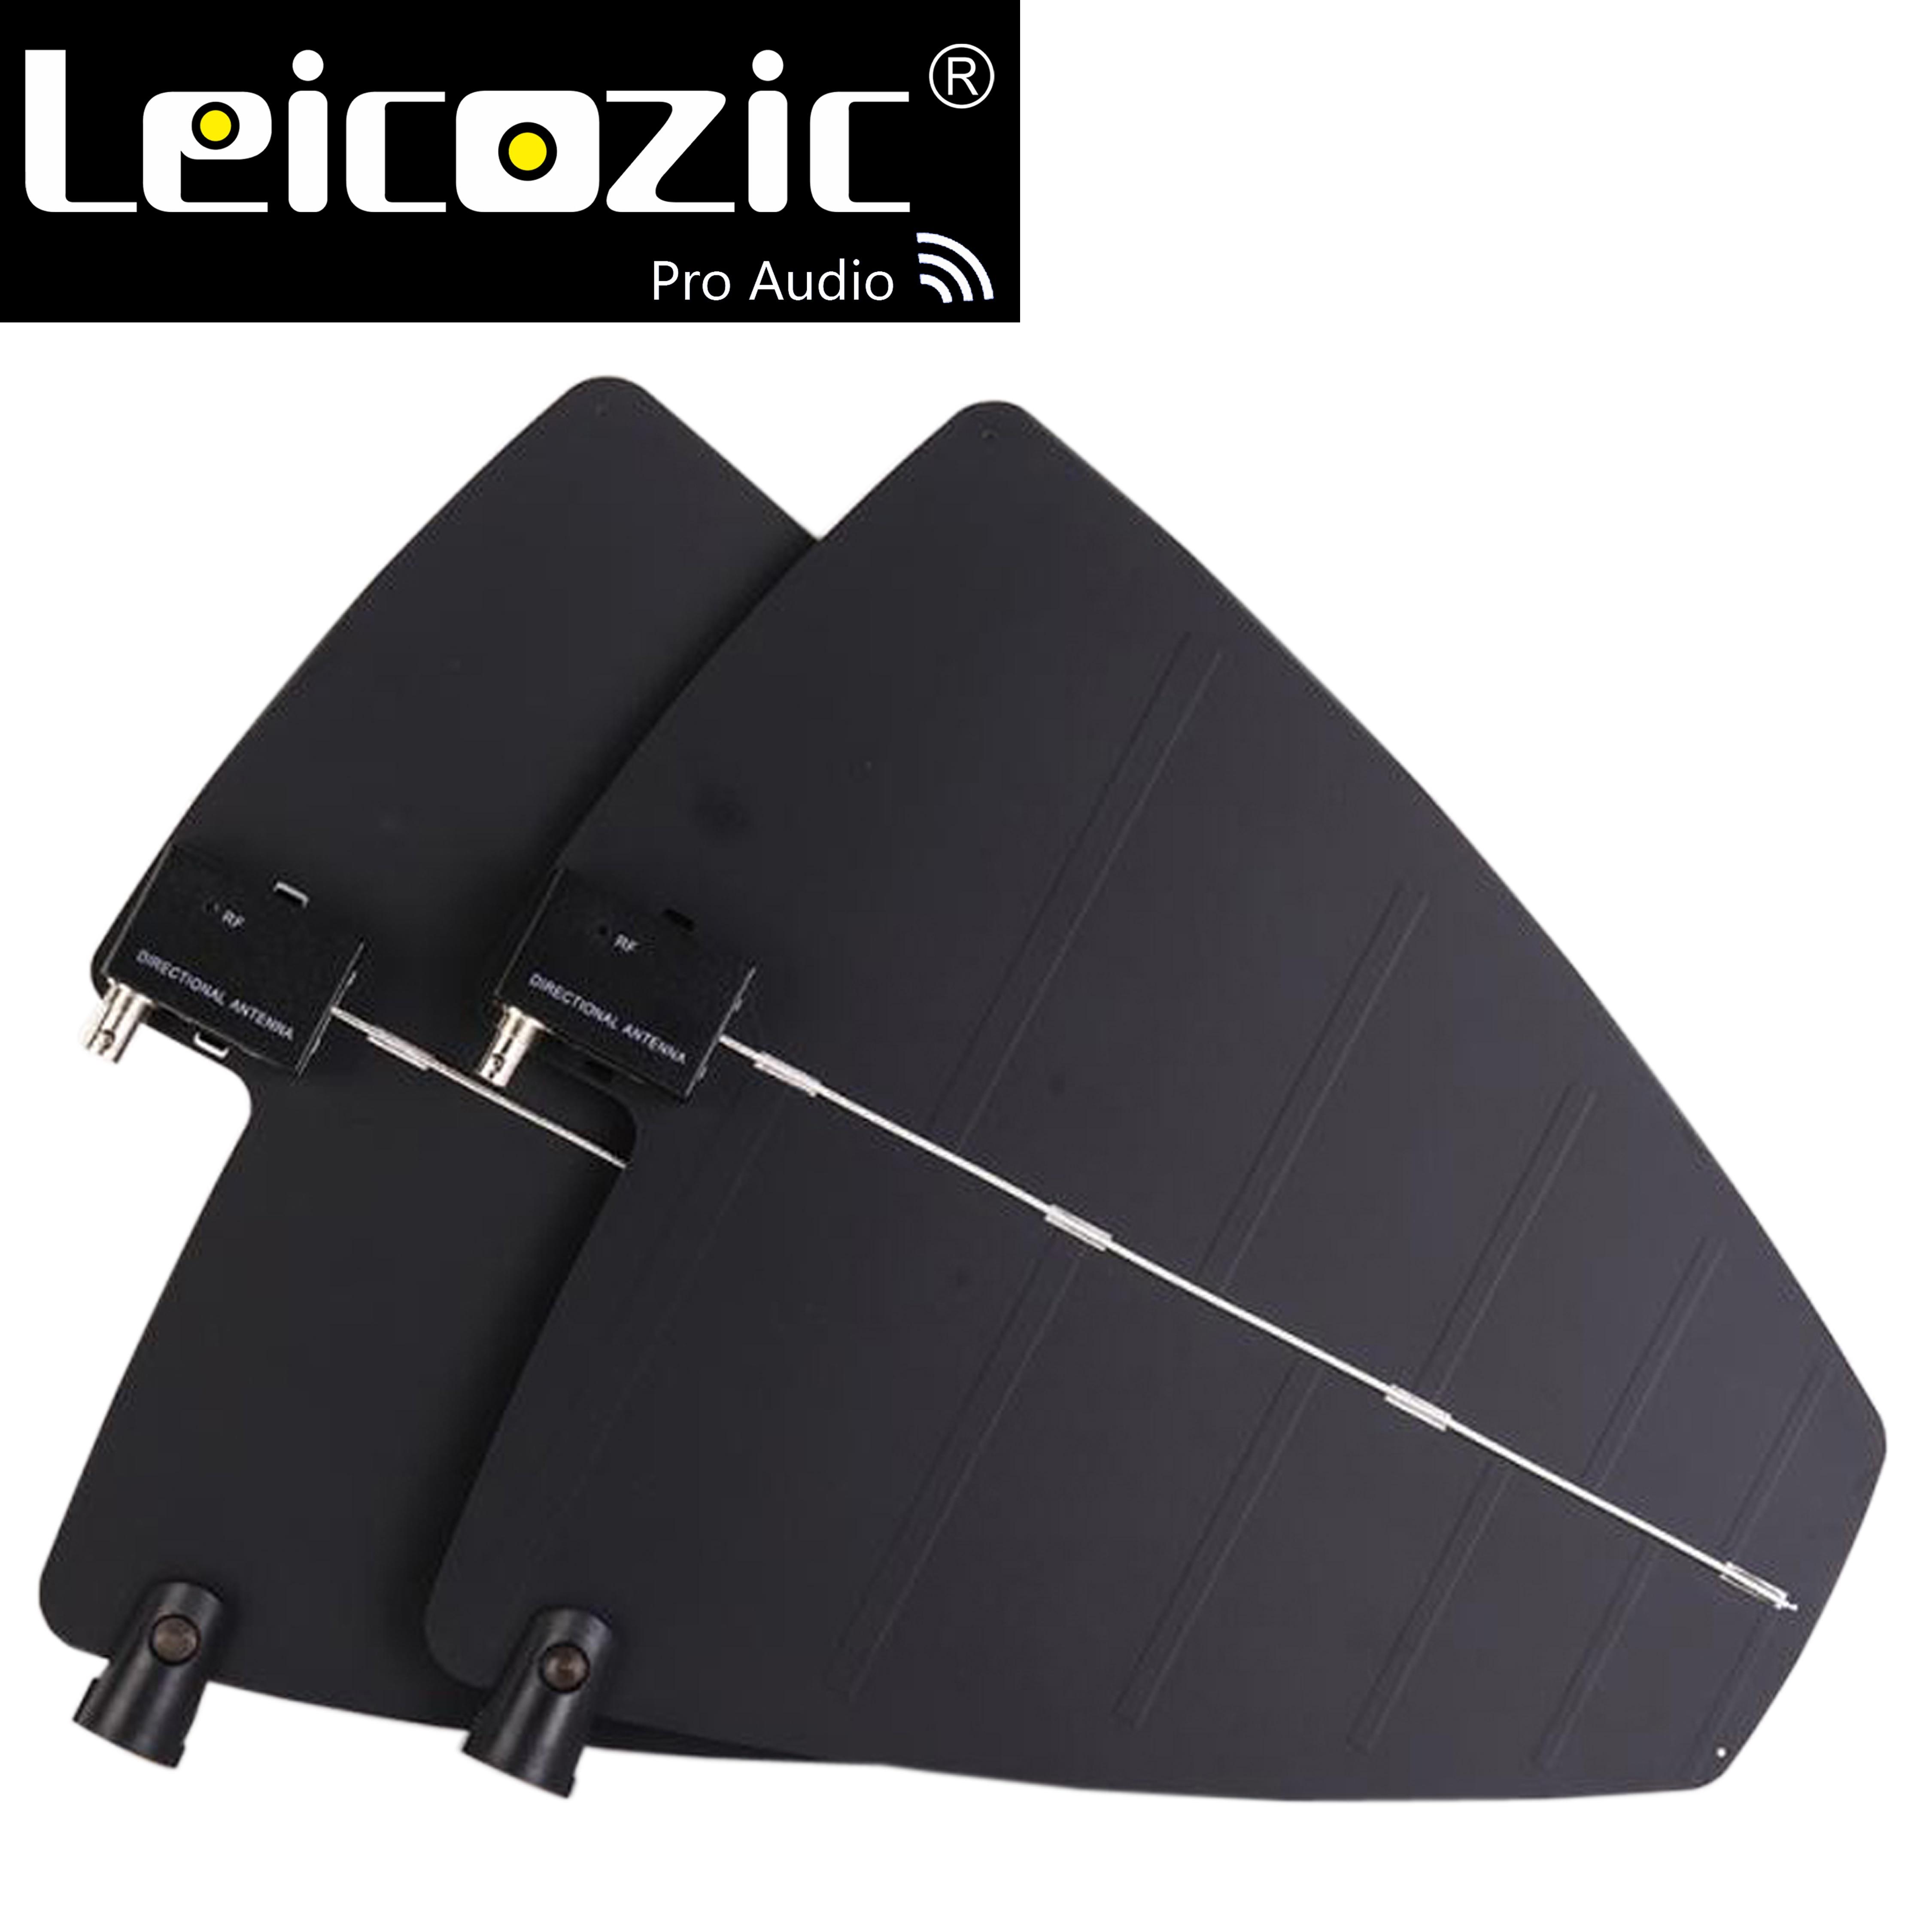 Leicozic 2X antena direccional activa y sistema Splitter Amp kit de antena UHF amplificador integrado para micrófono UHF inalámbrico